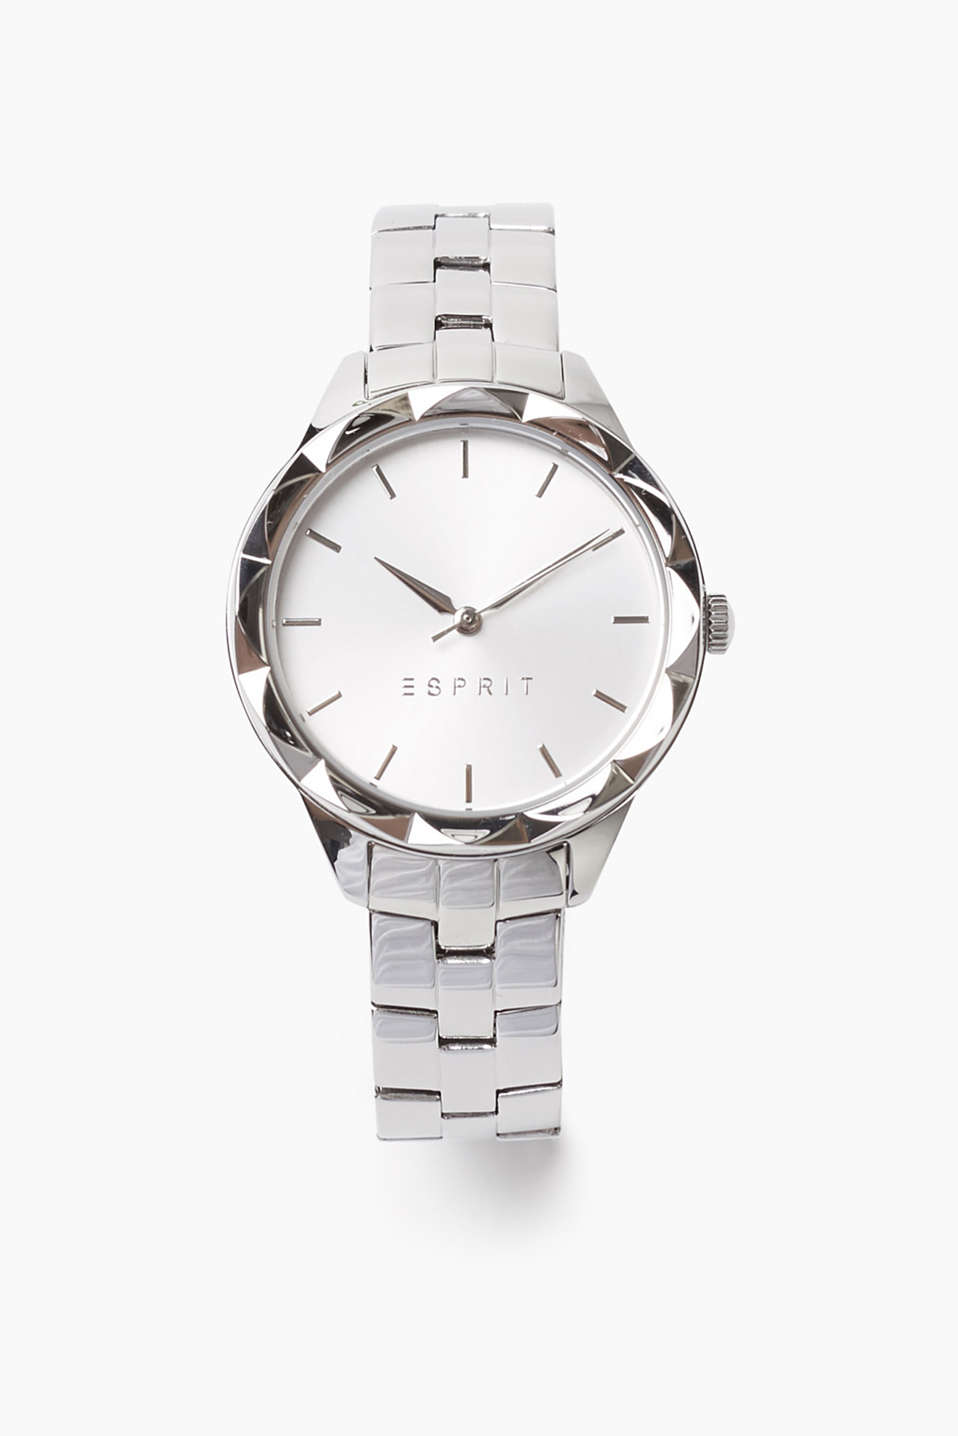 Esprit stainless steel studs watch metal bracelet at